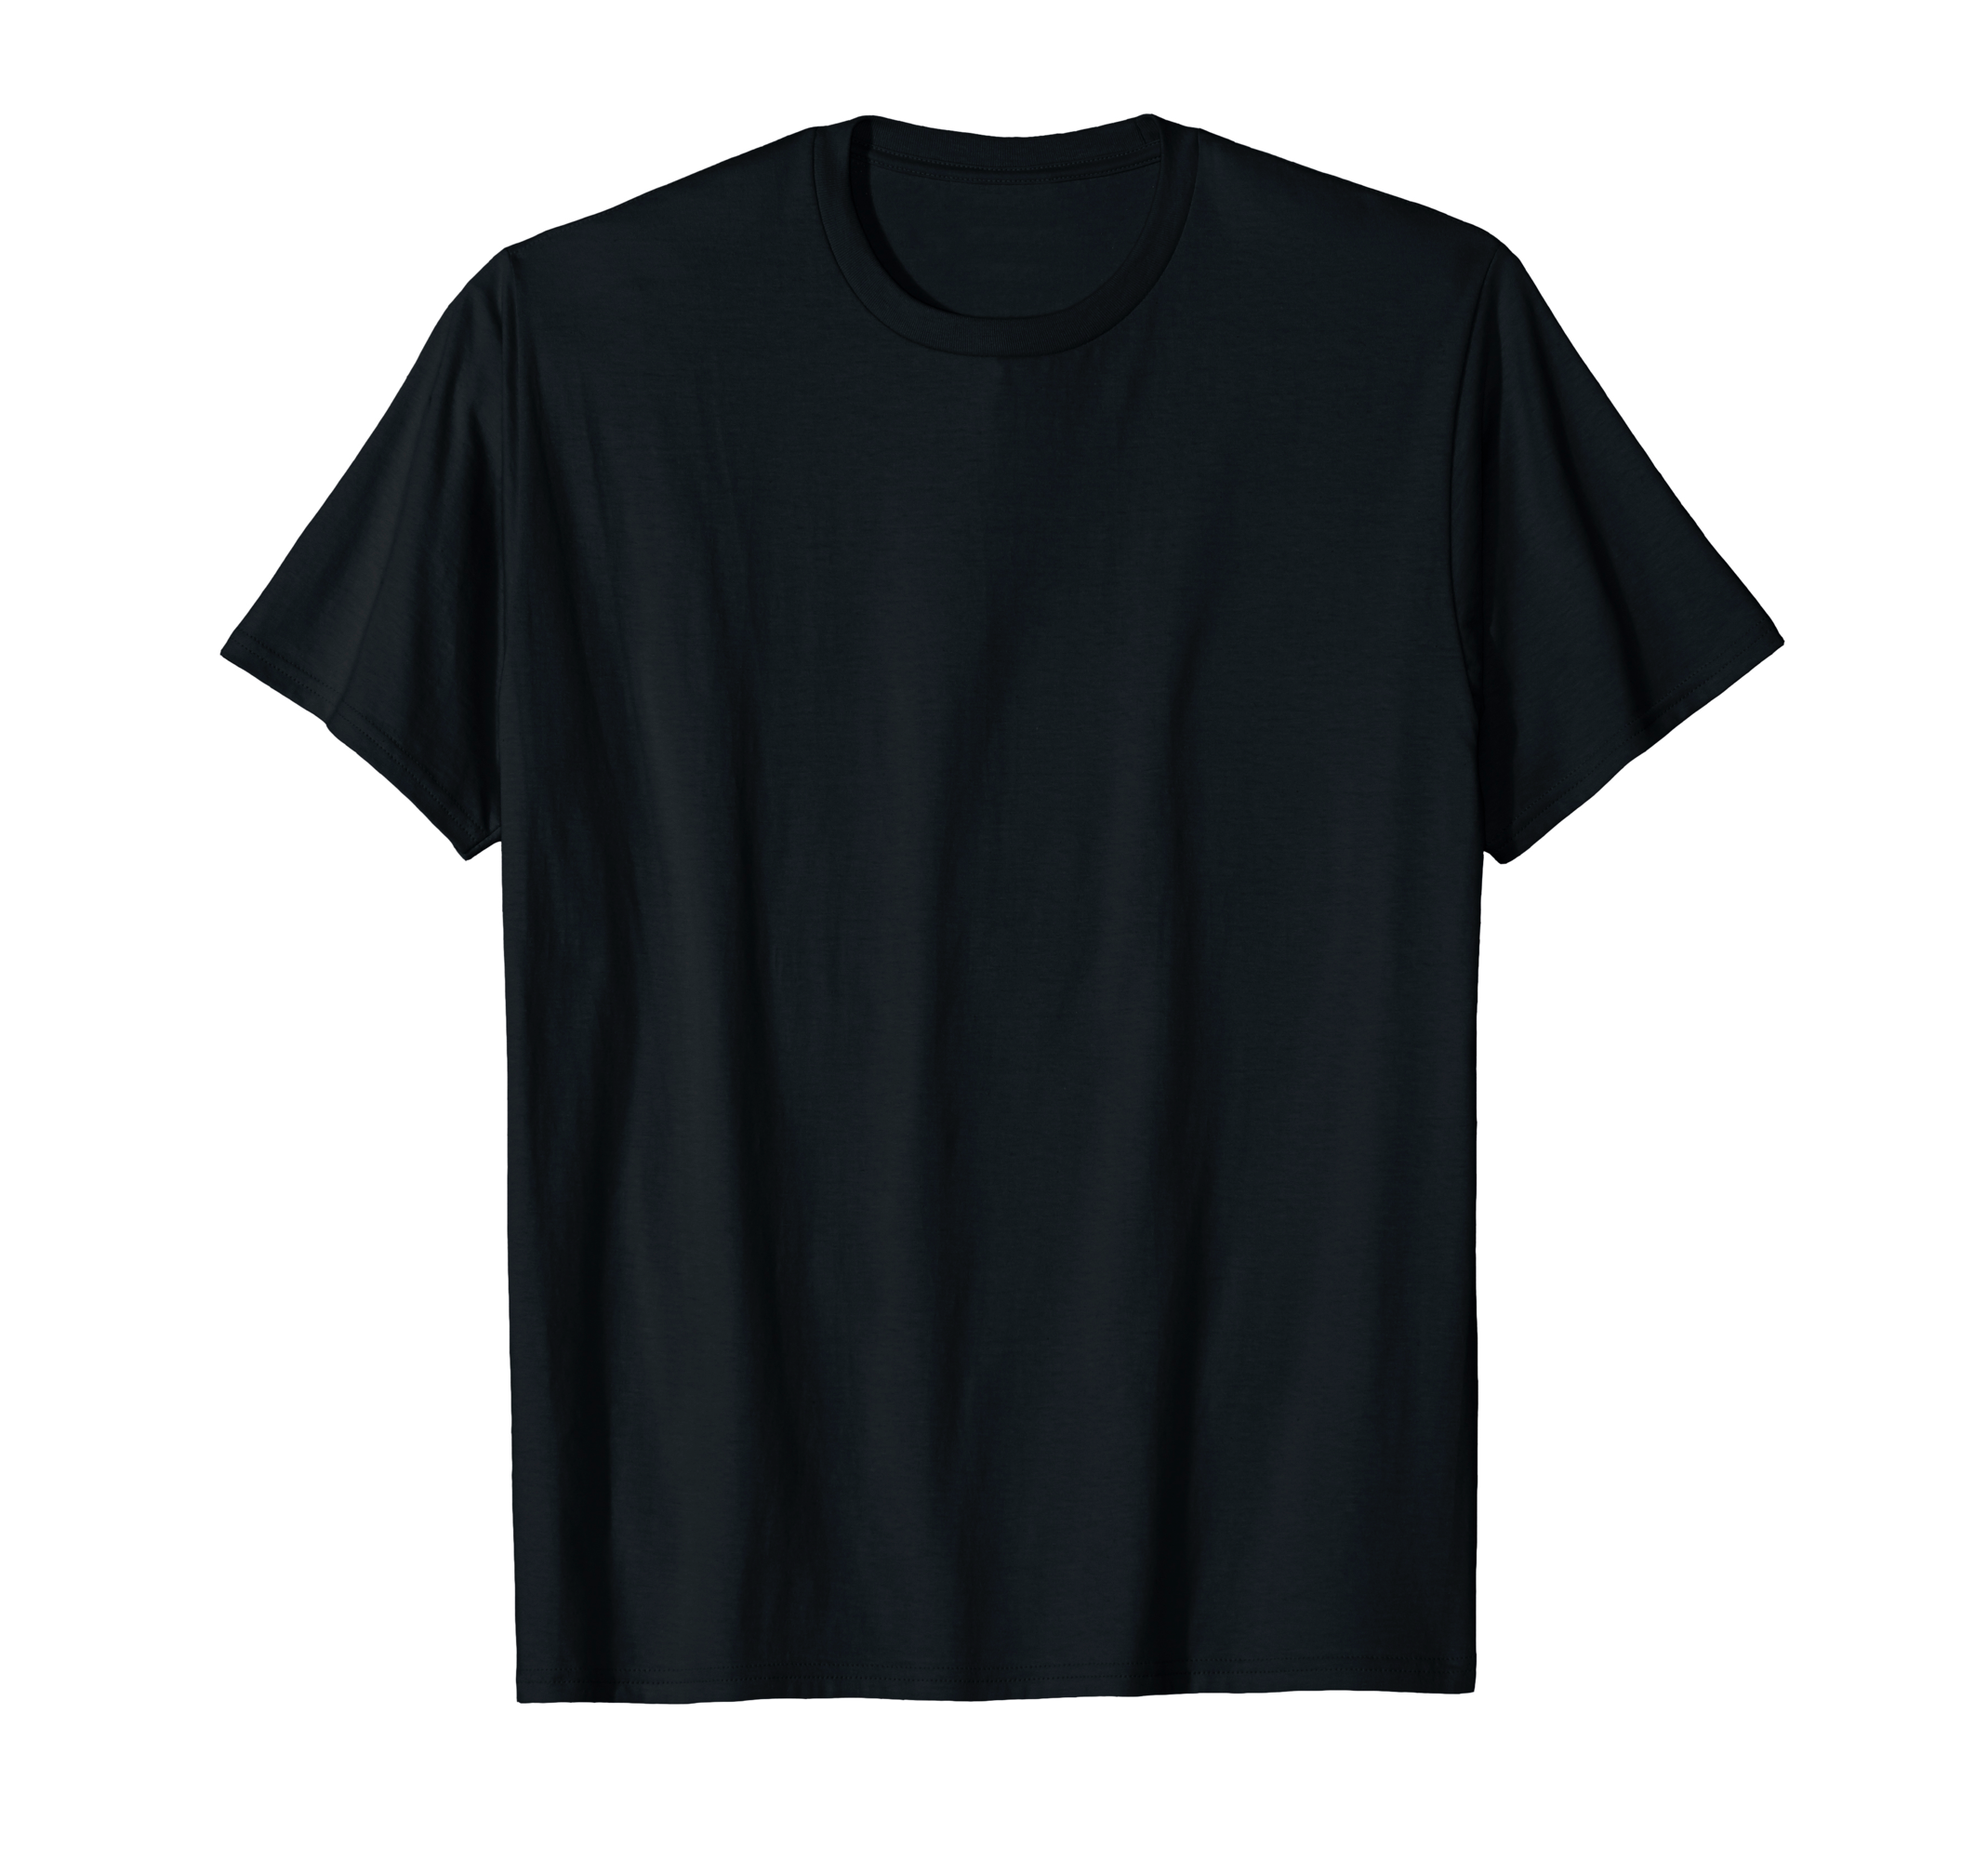 Vision Street Wear Skateboard Equipment T-shirt Cotton 100/% Size S-XL